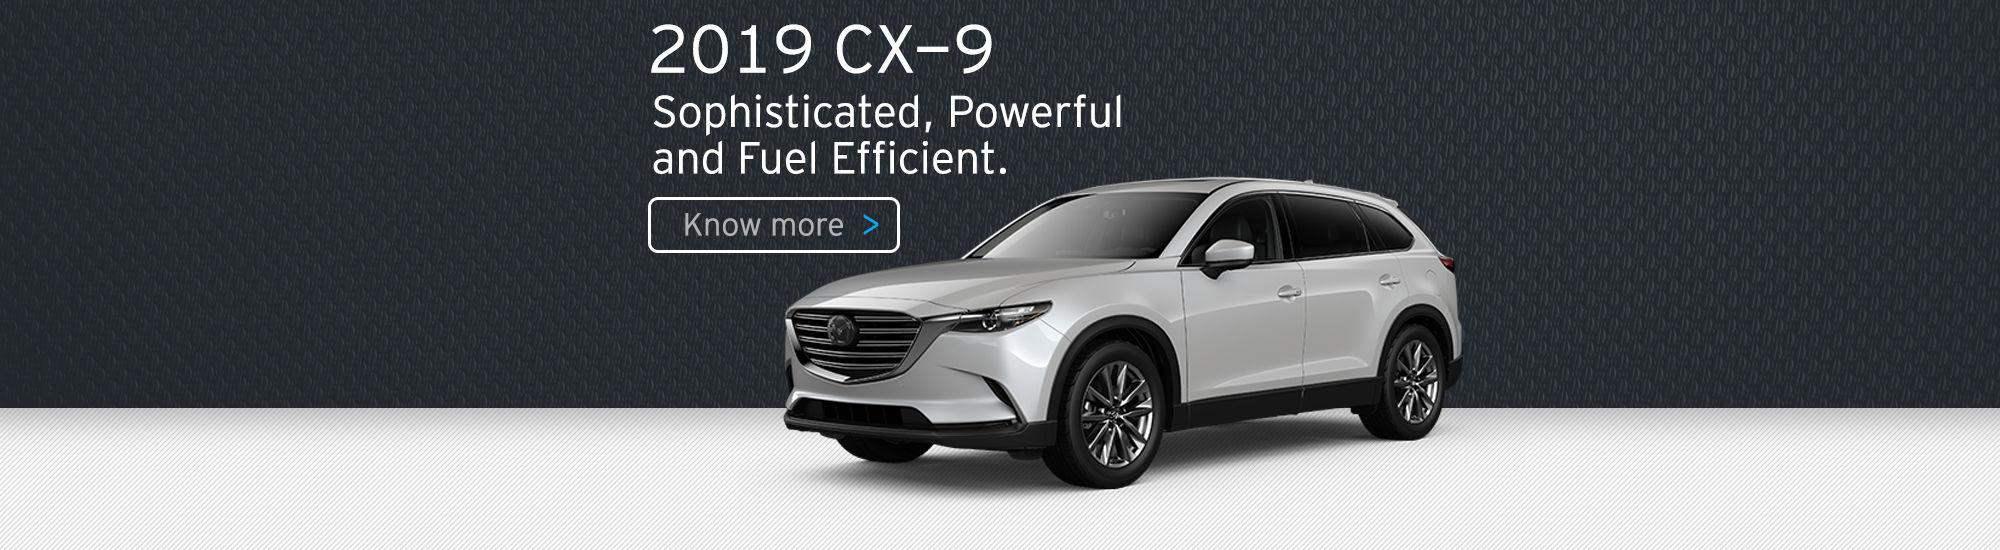 2019 CX-9